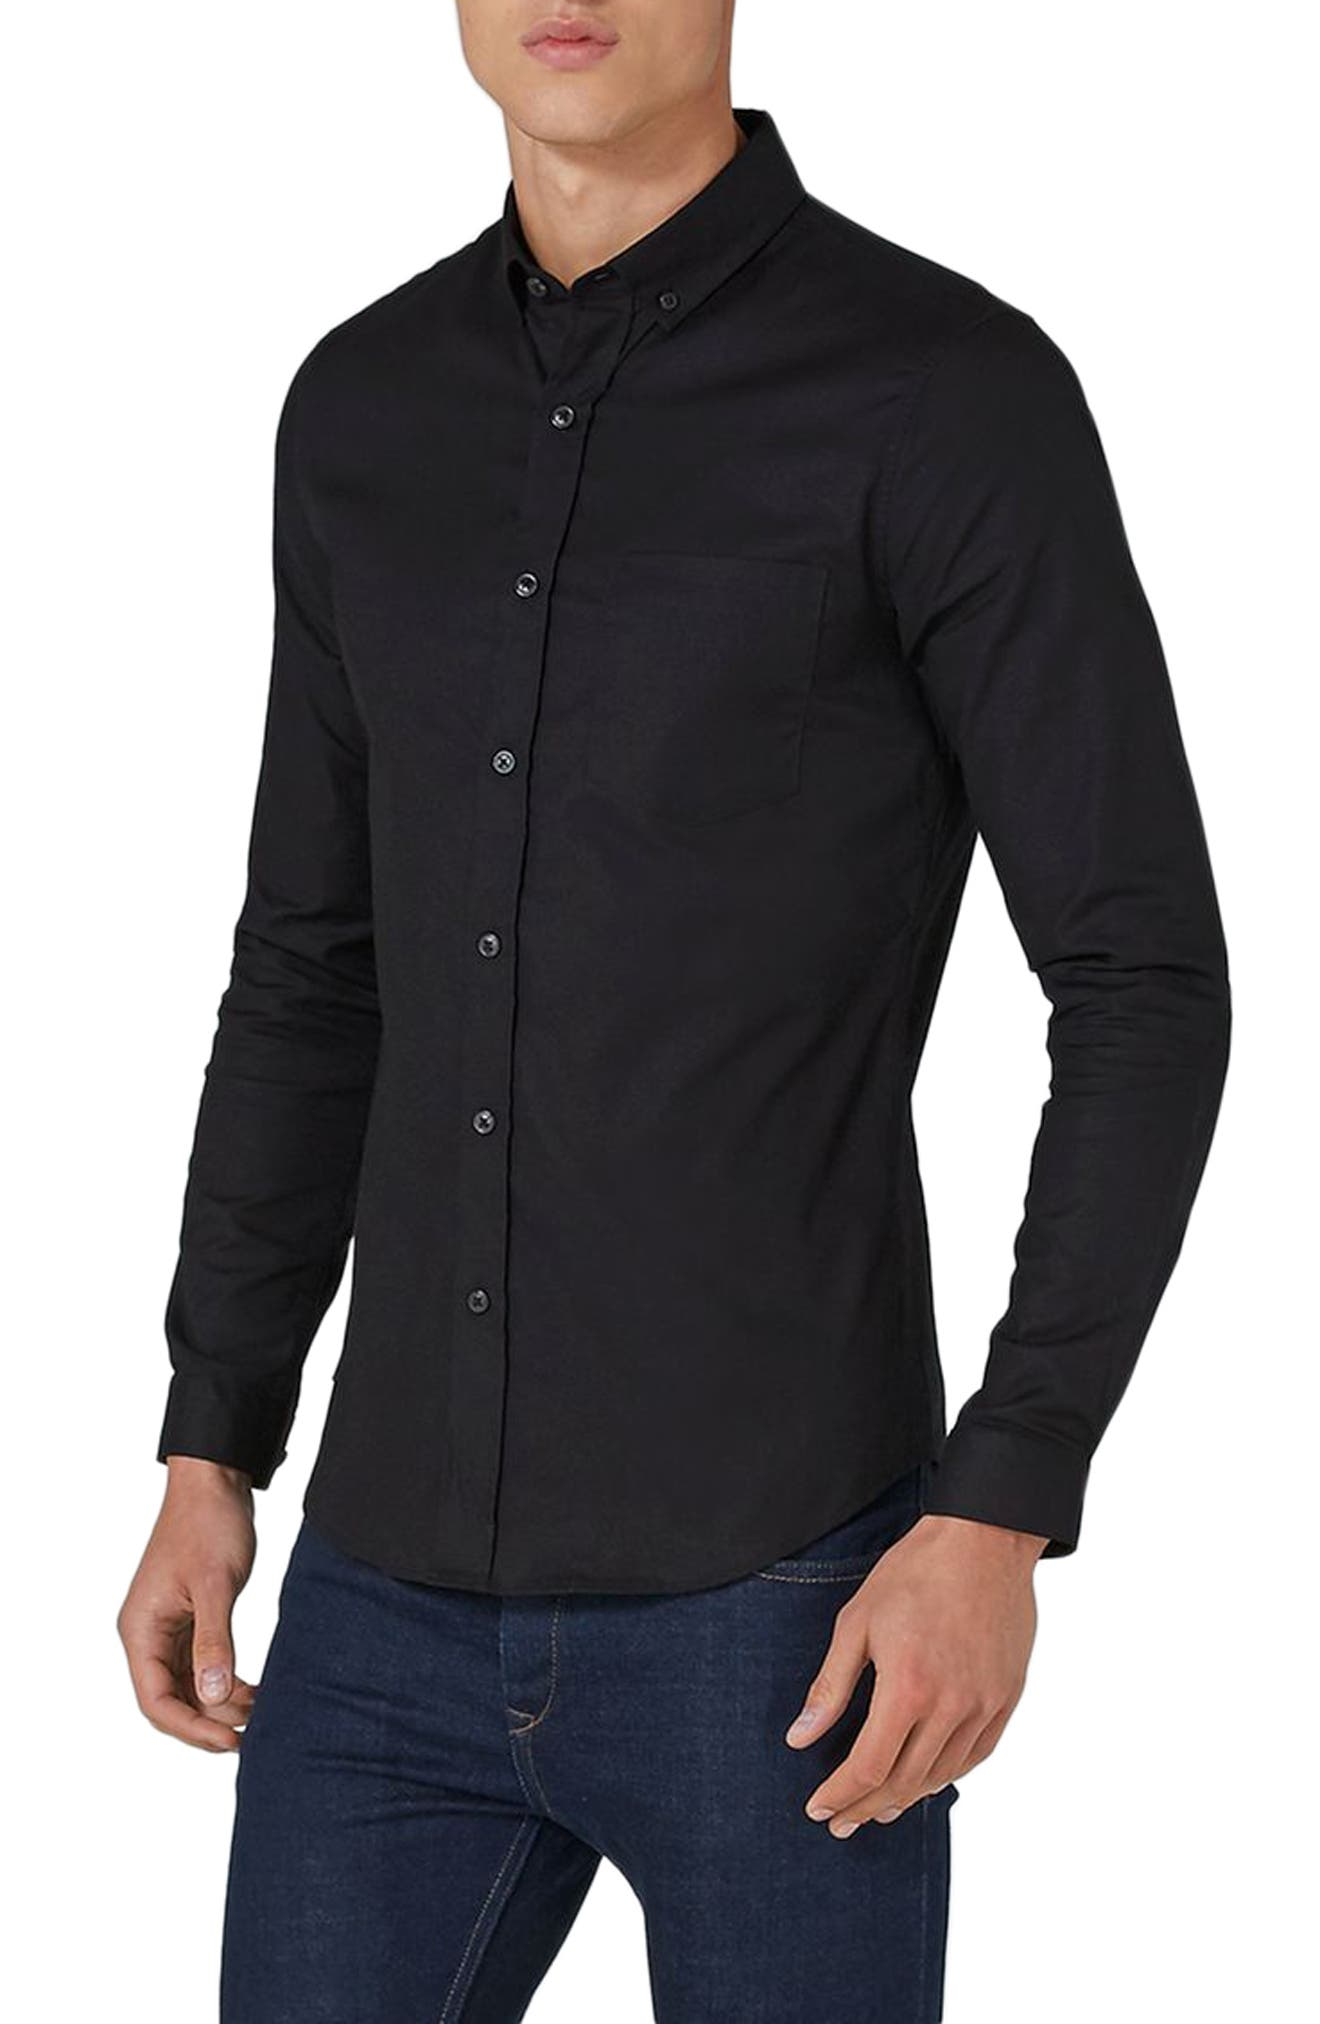 Muscle Fit Oxford Shirt,                             Main thumbnail 1, color,                             Black